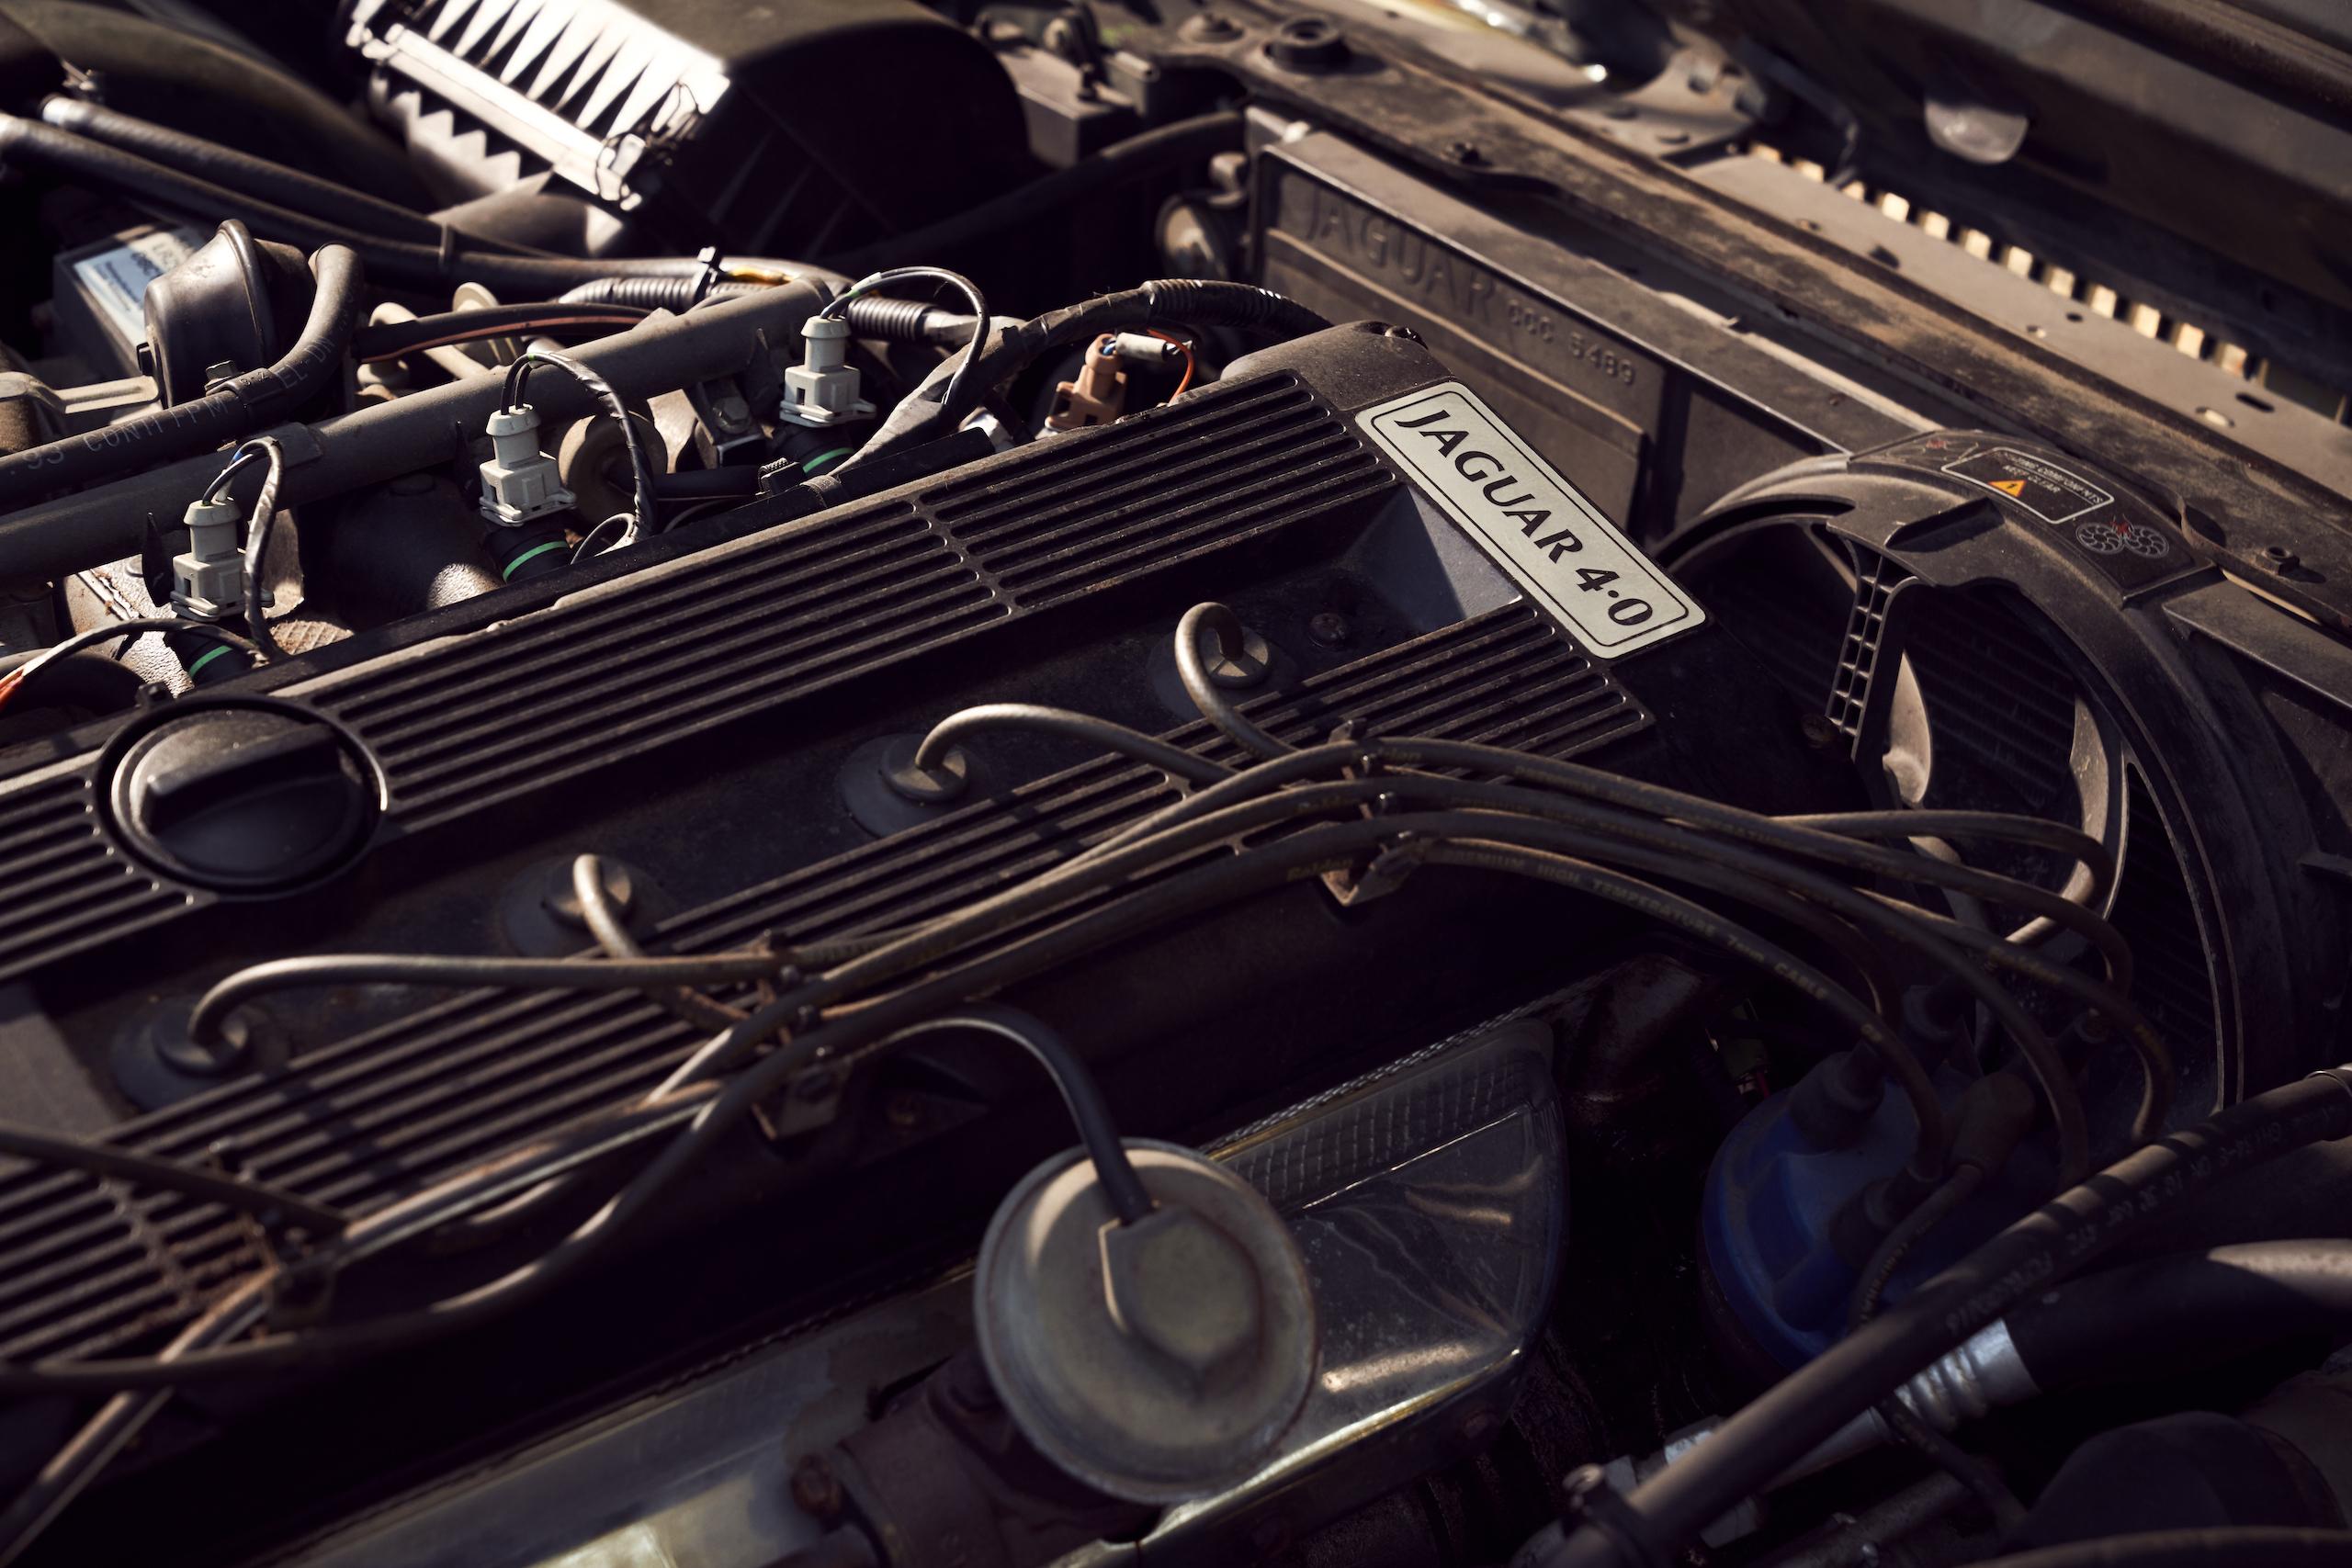 Jaguar XJ6 engine